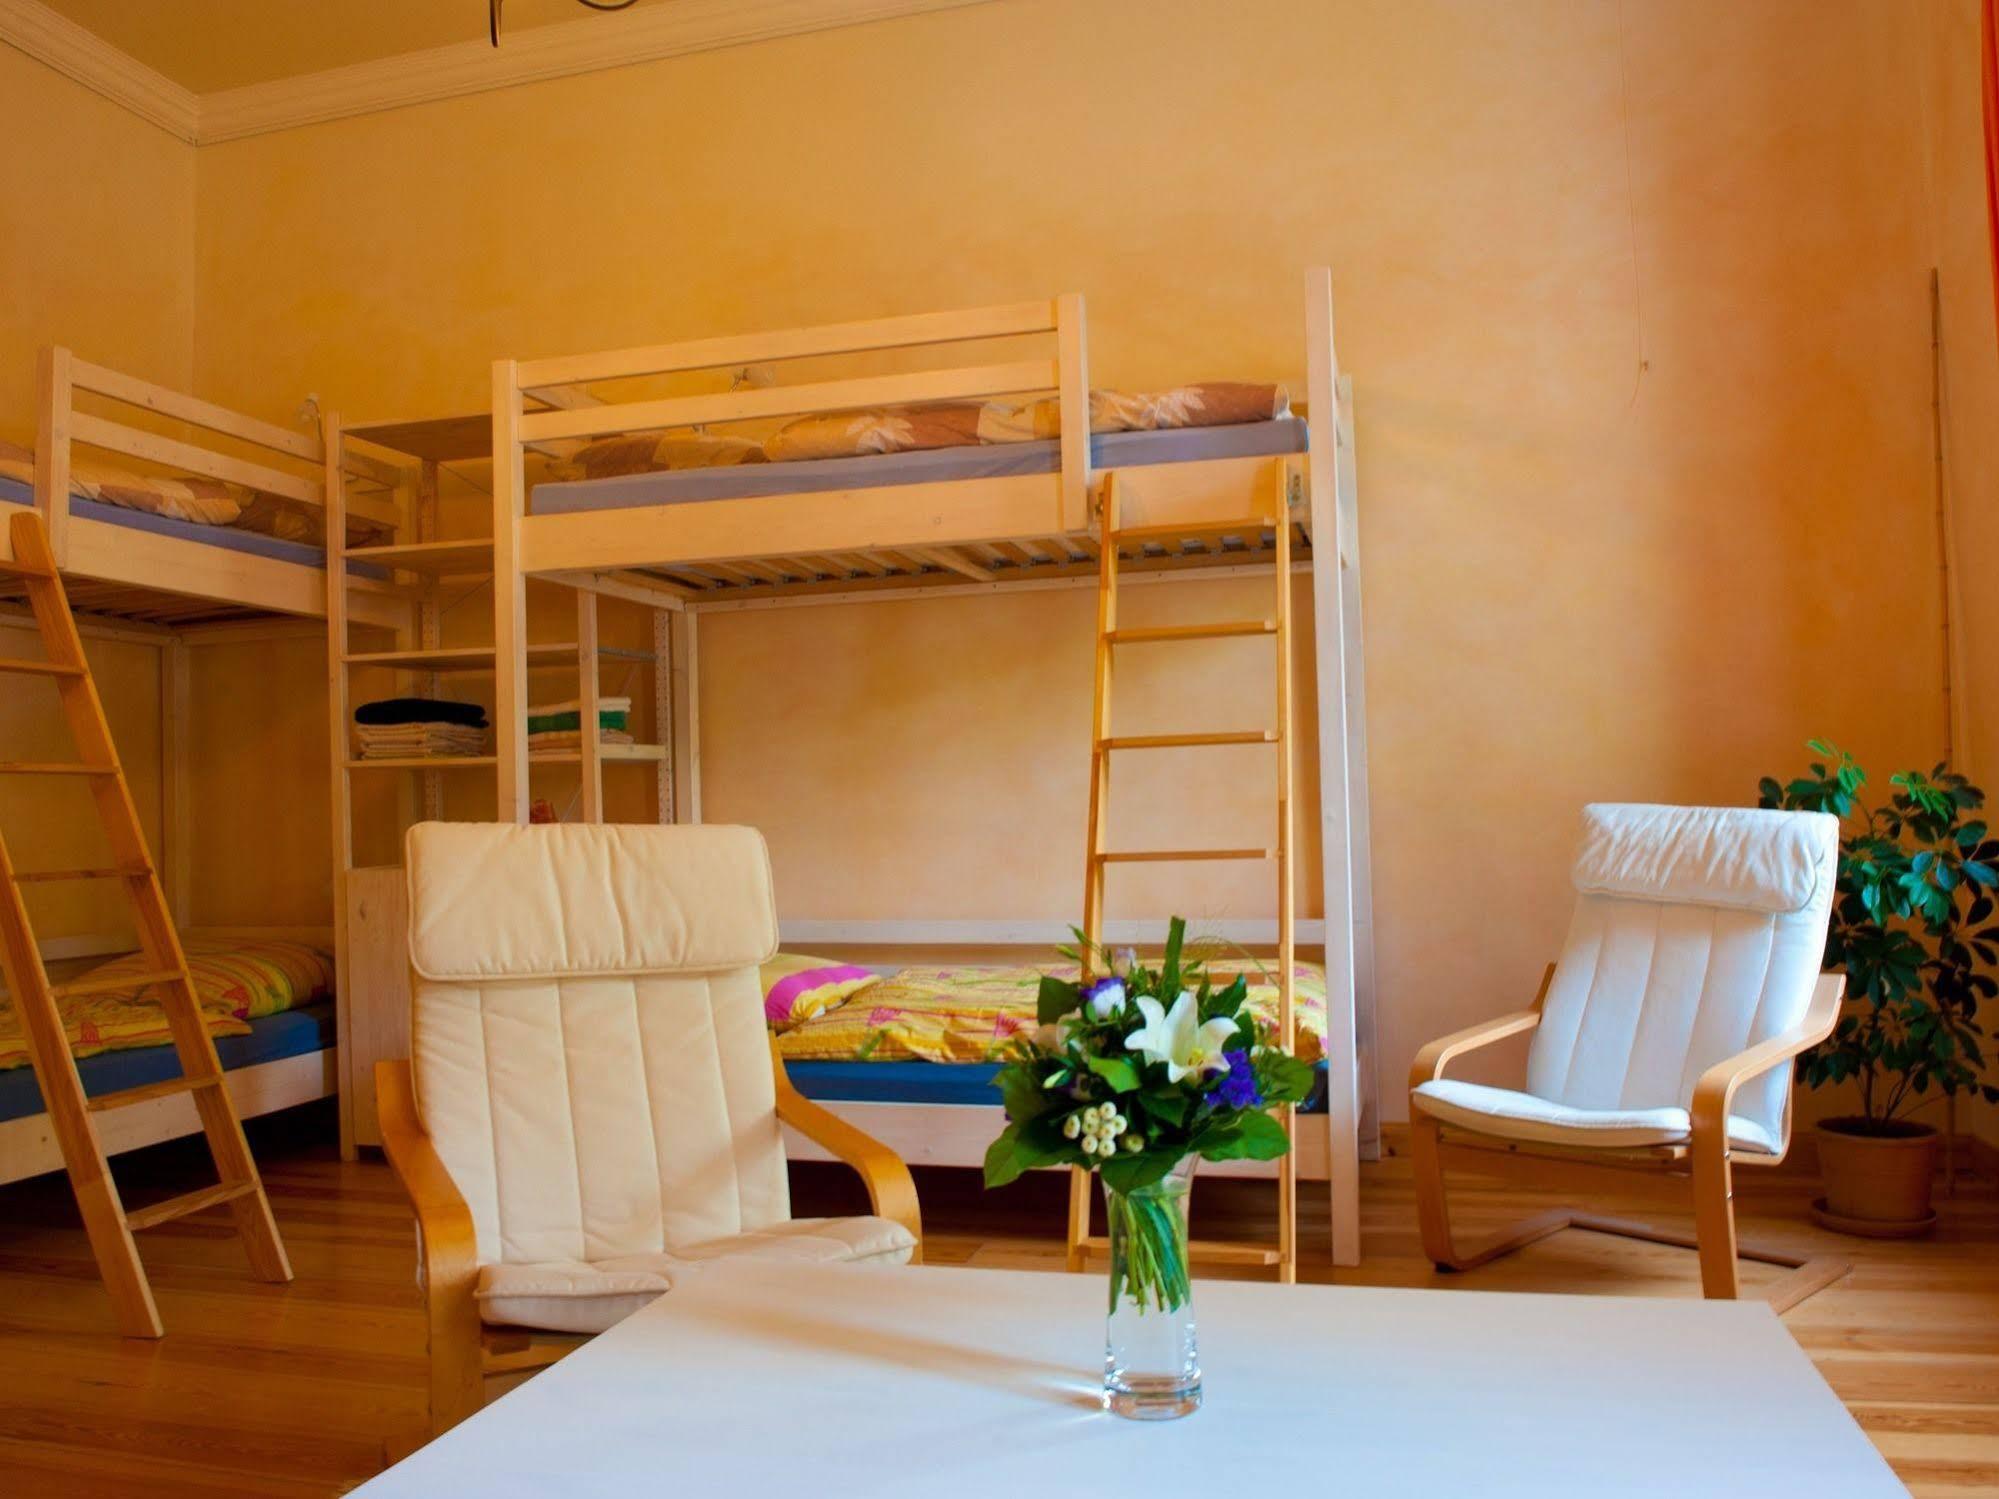 Excellent Apartments Kreuzberg (اکسسلنت آپارتمنتس كروزبرگ)